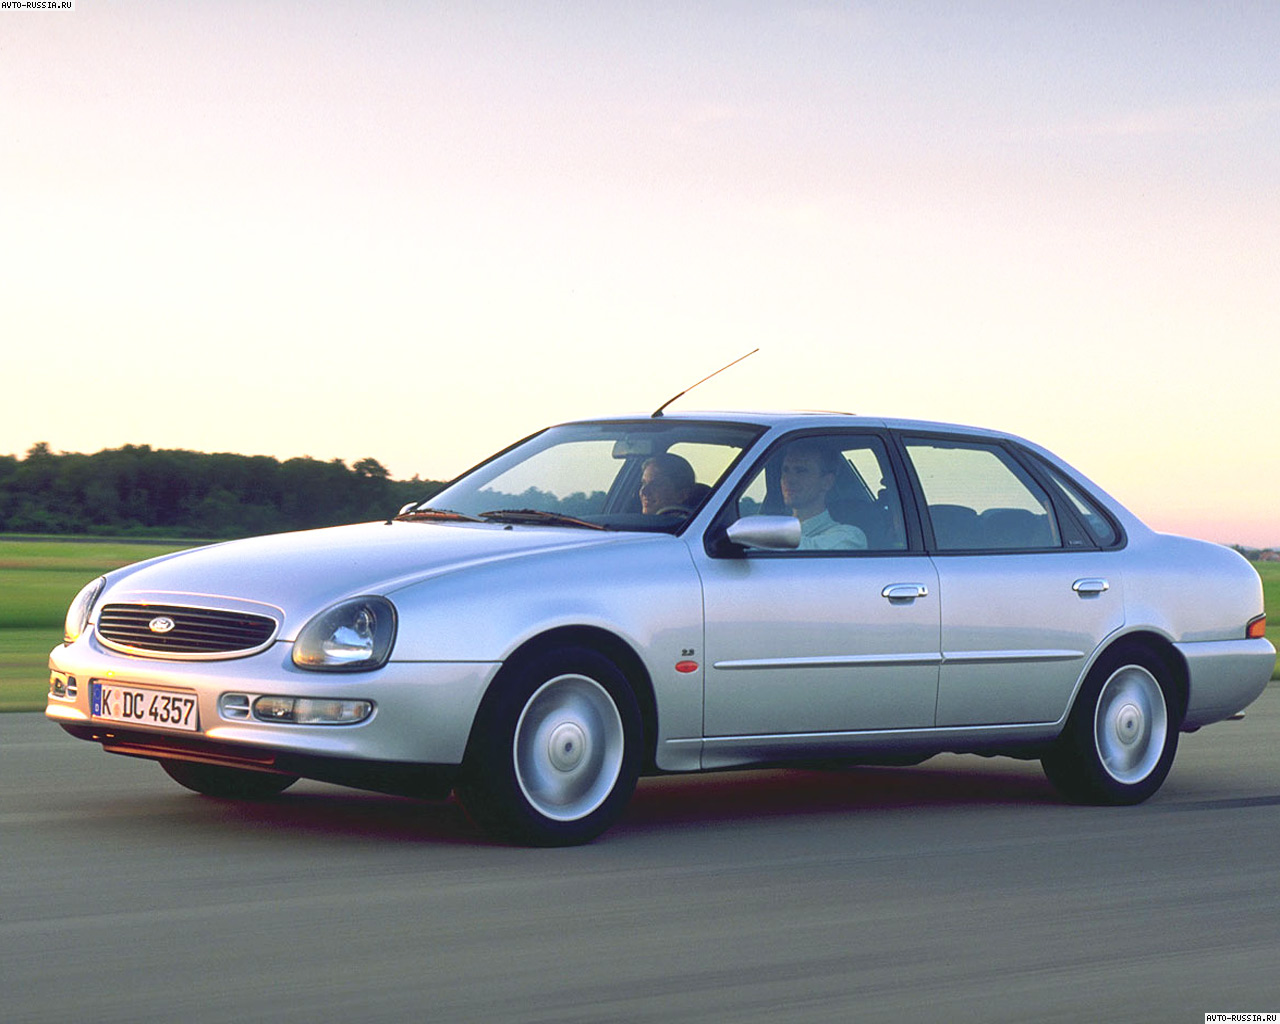 Форд скорпио 1995 фото